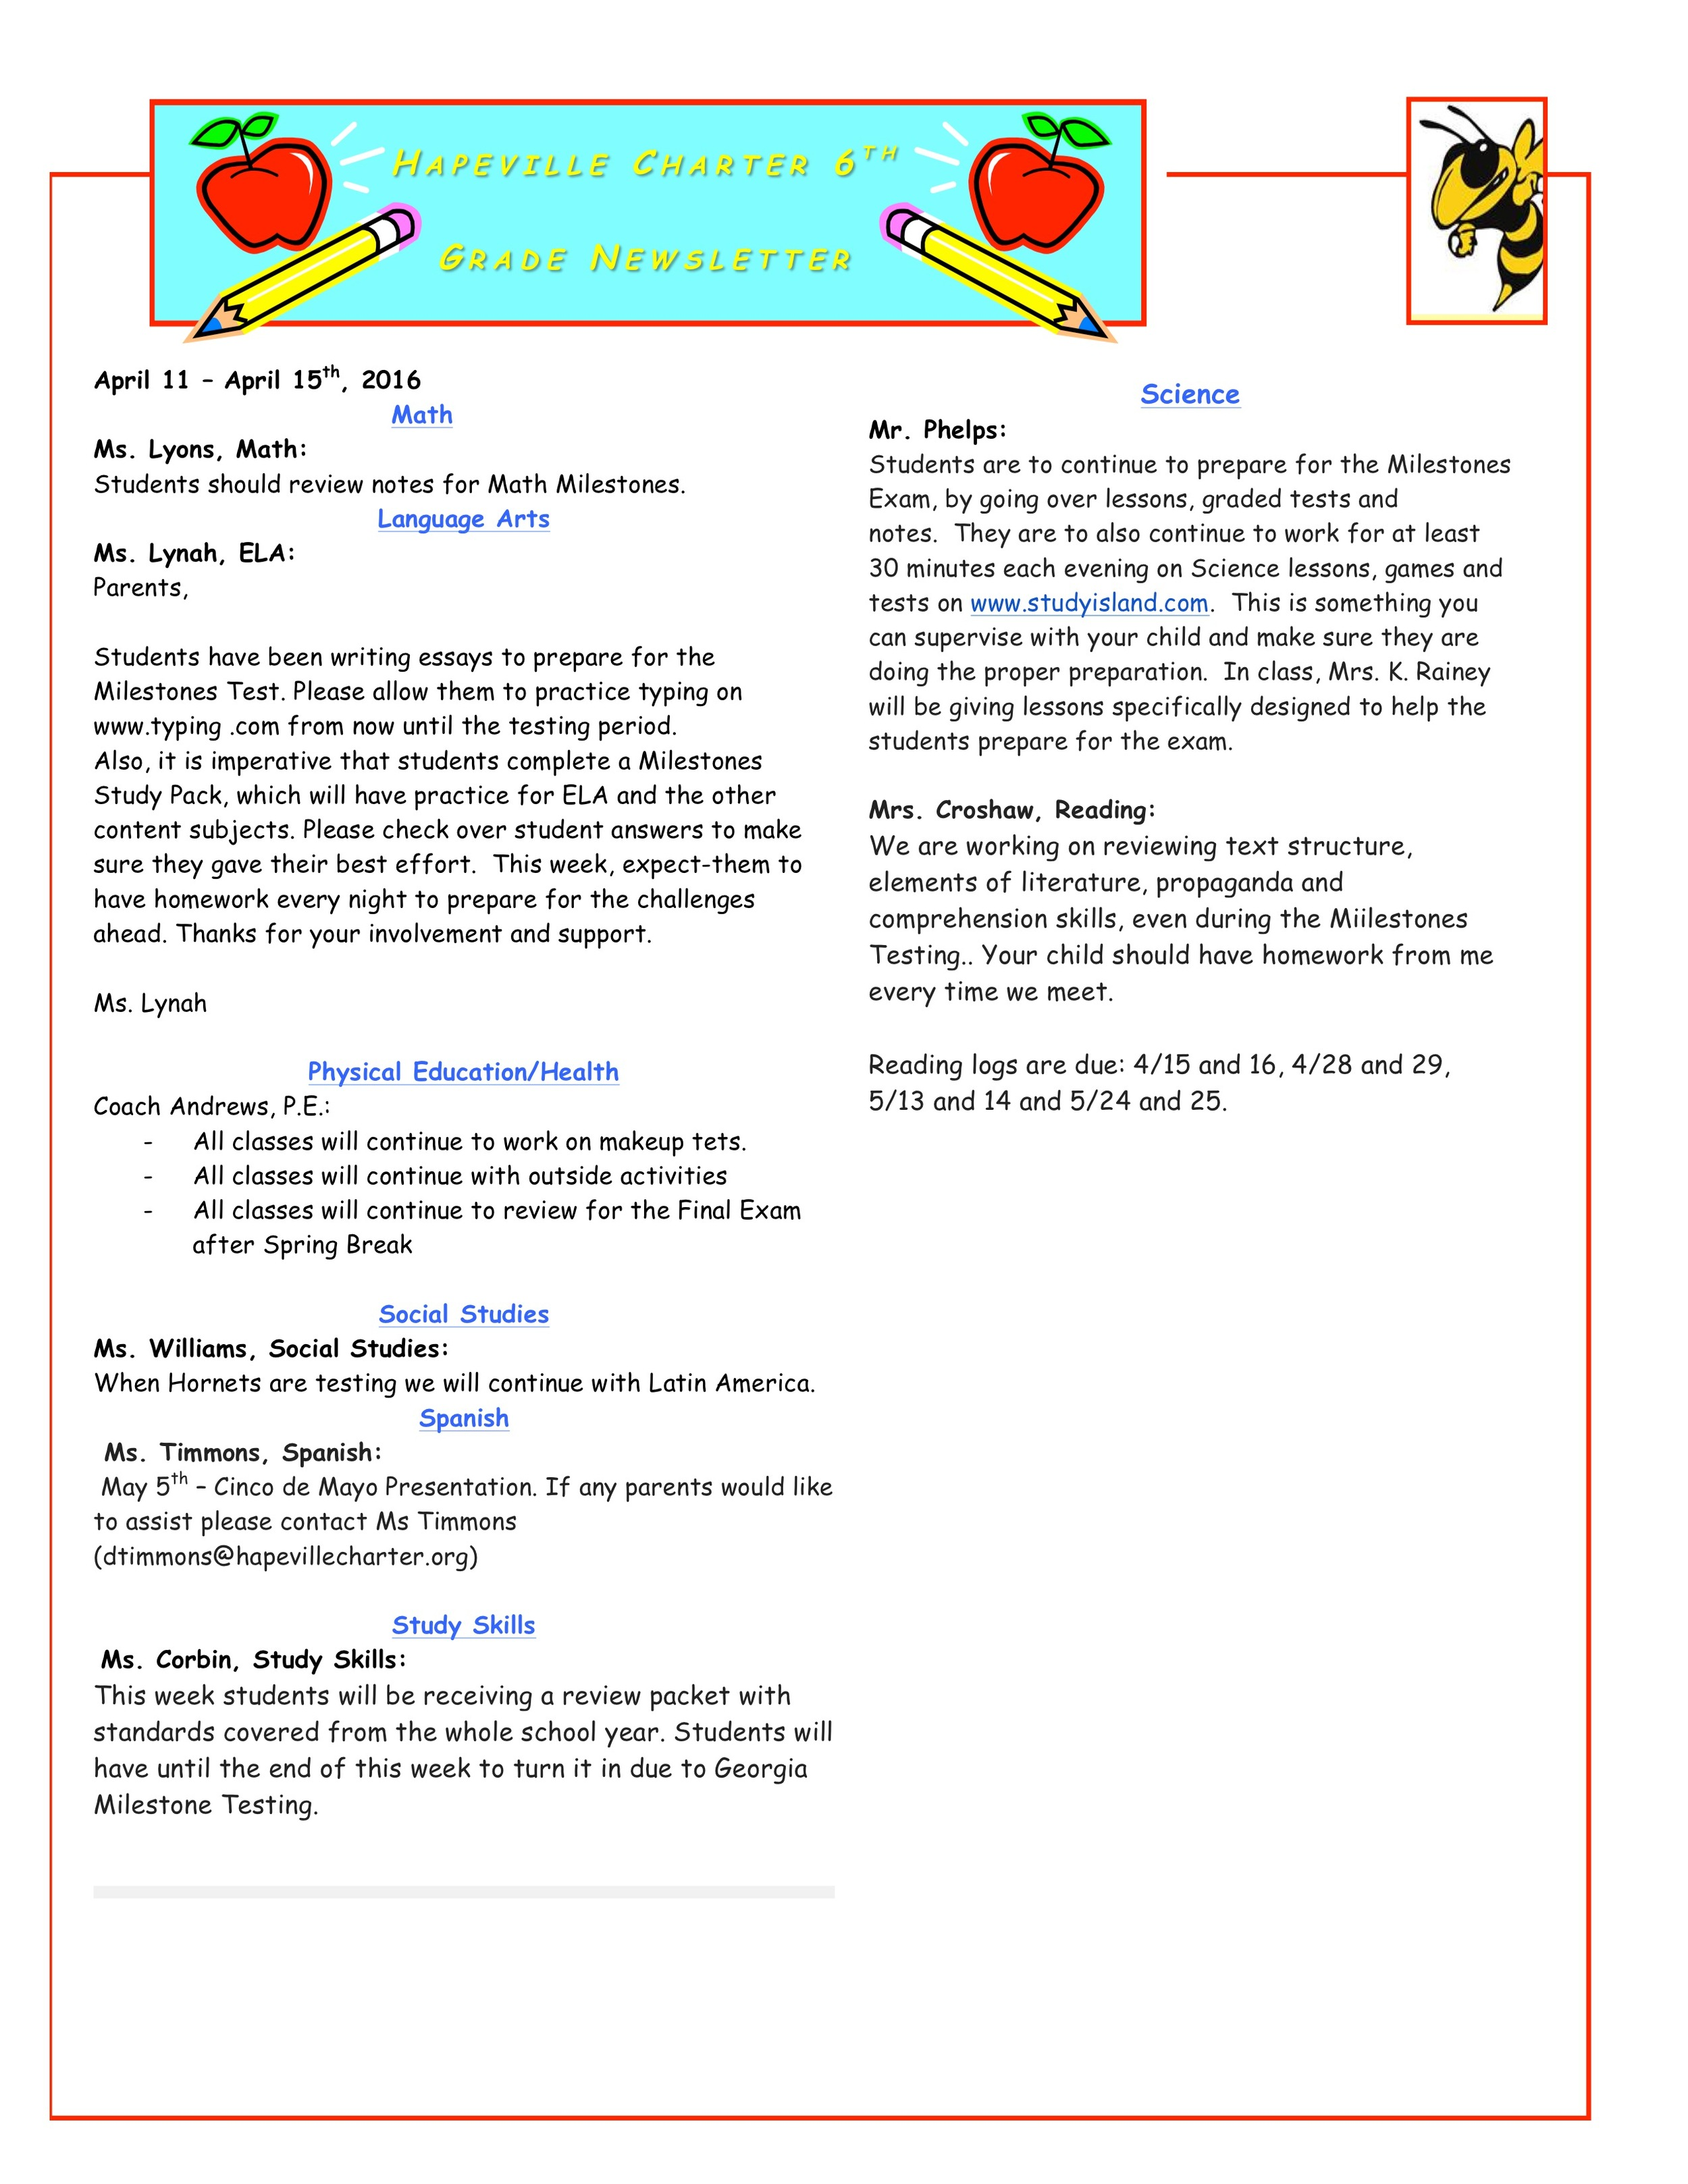 Newsletter Image6th Grade 4-11-2016.jpeg